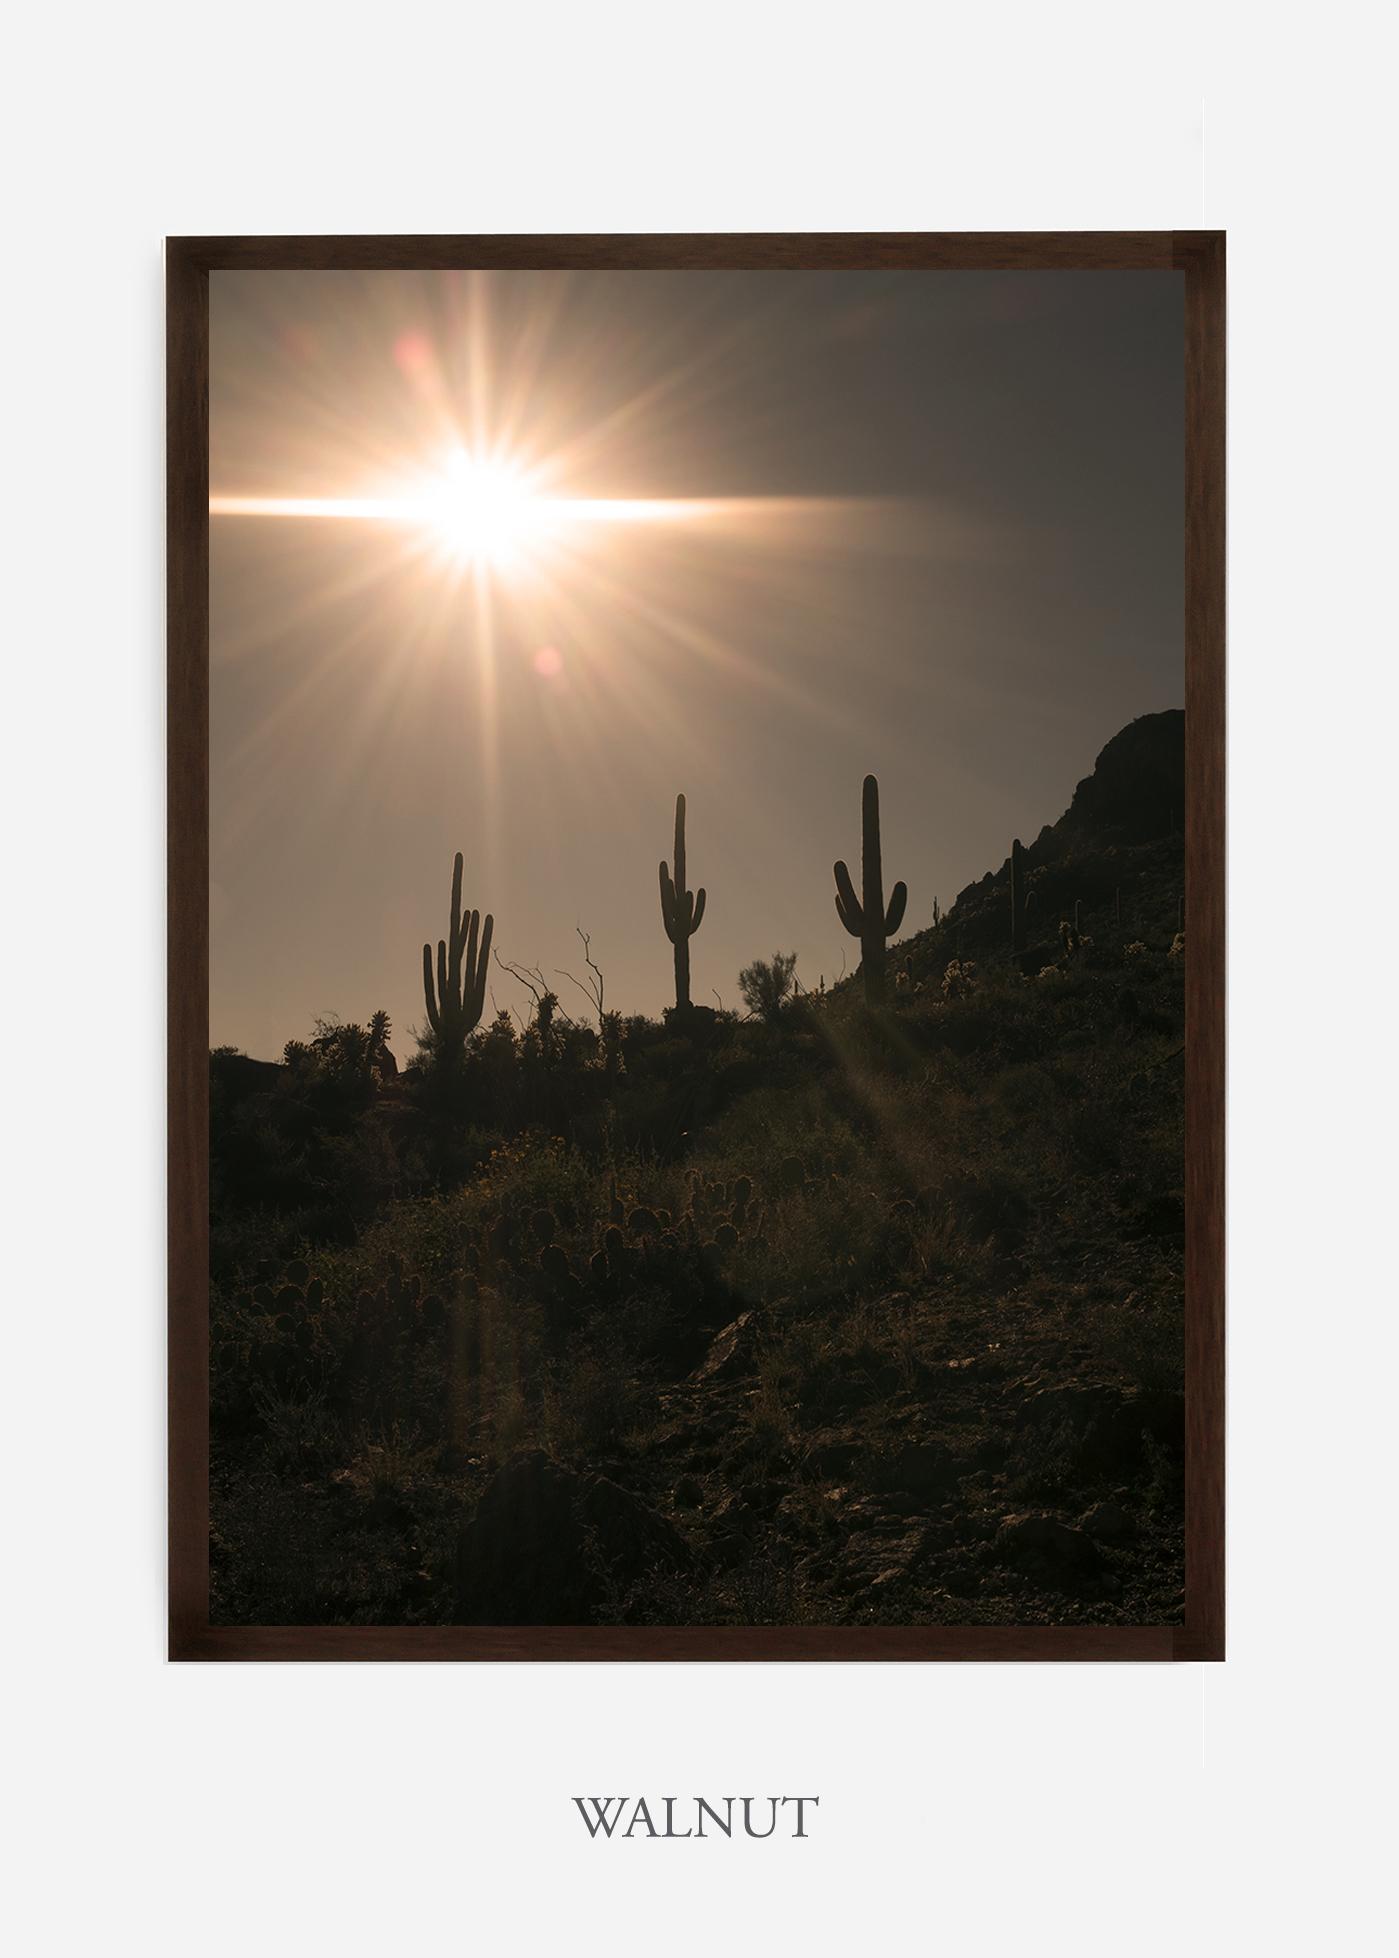 nomat-walnutframe-saguaroNo.16-wildercalifornia-art-wallart-cactusprint-homedecor-prints-arizona-botanical-artwork-interiordesign.jpg